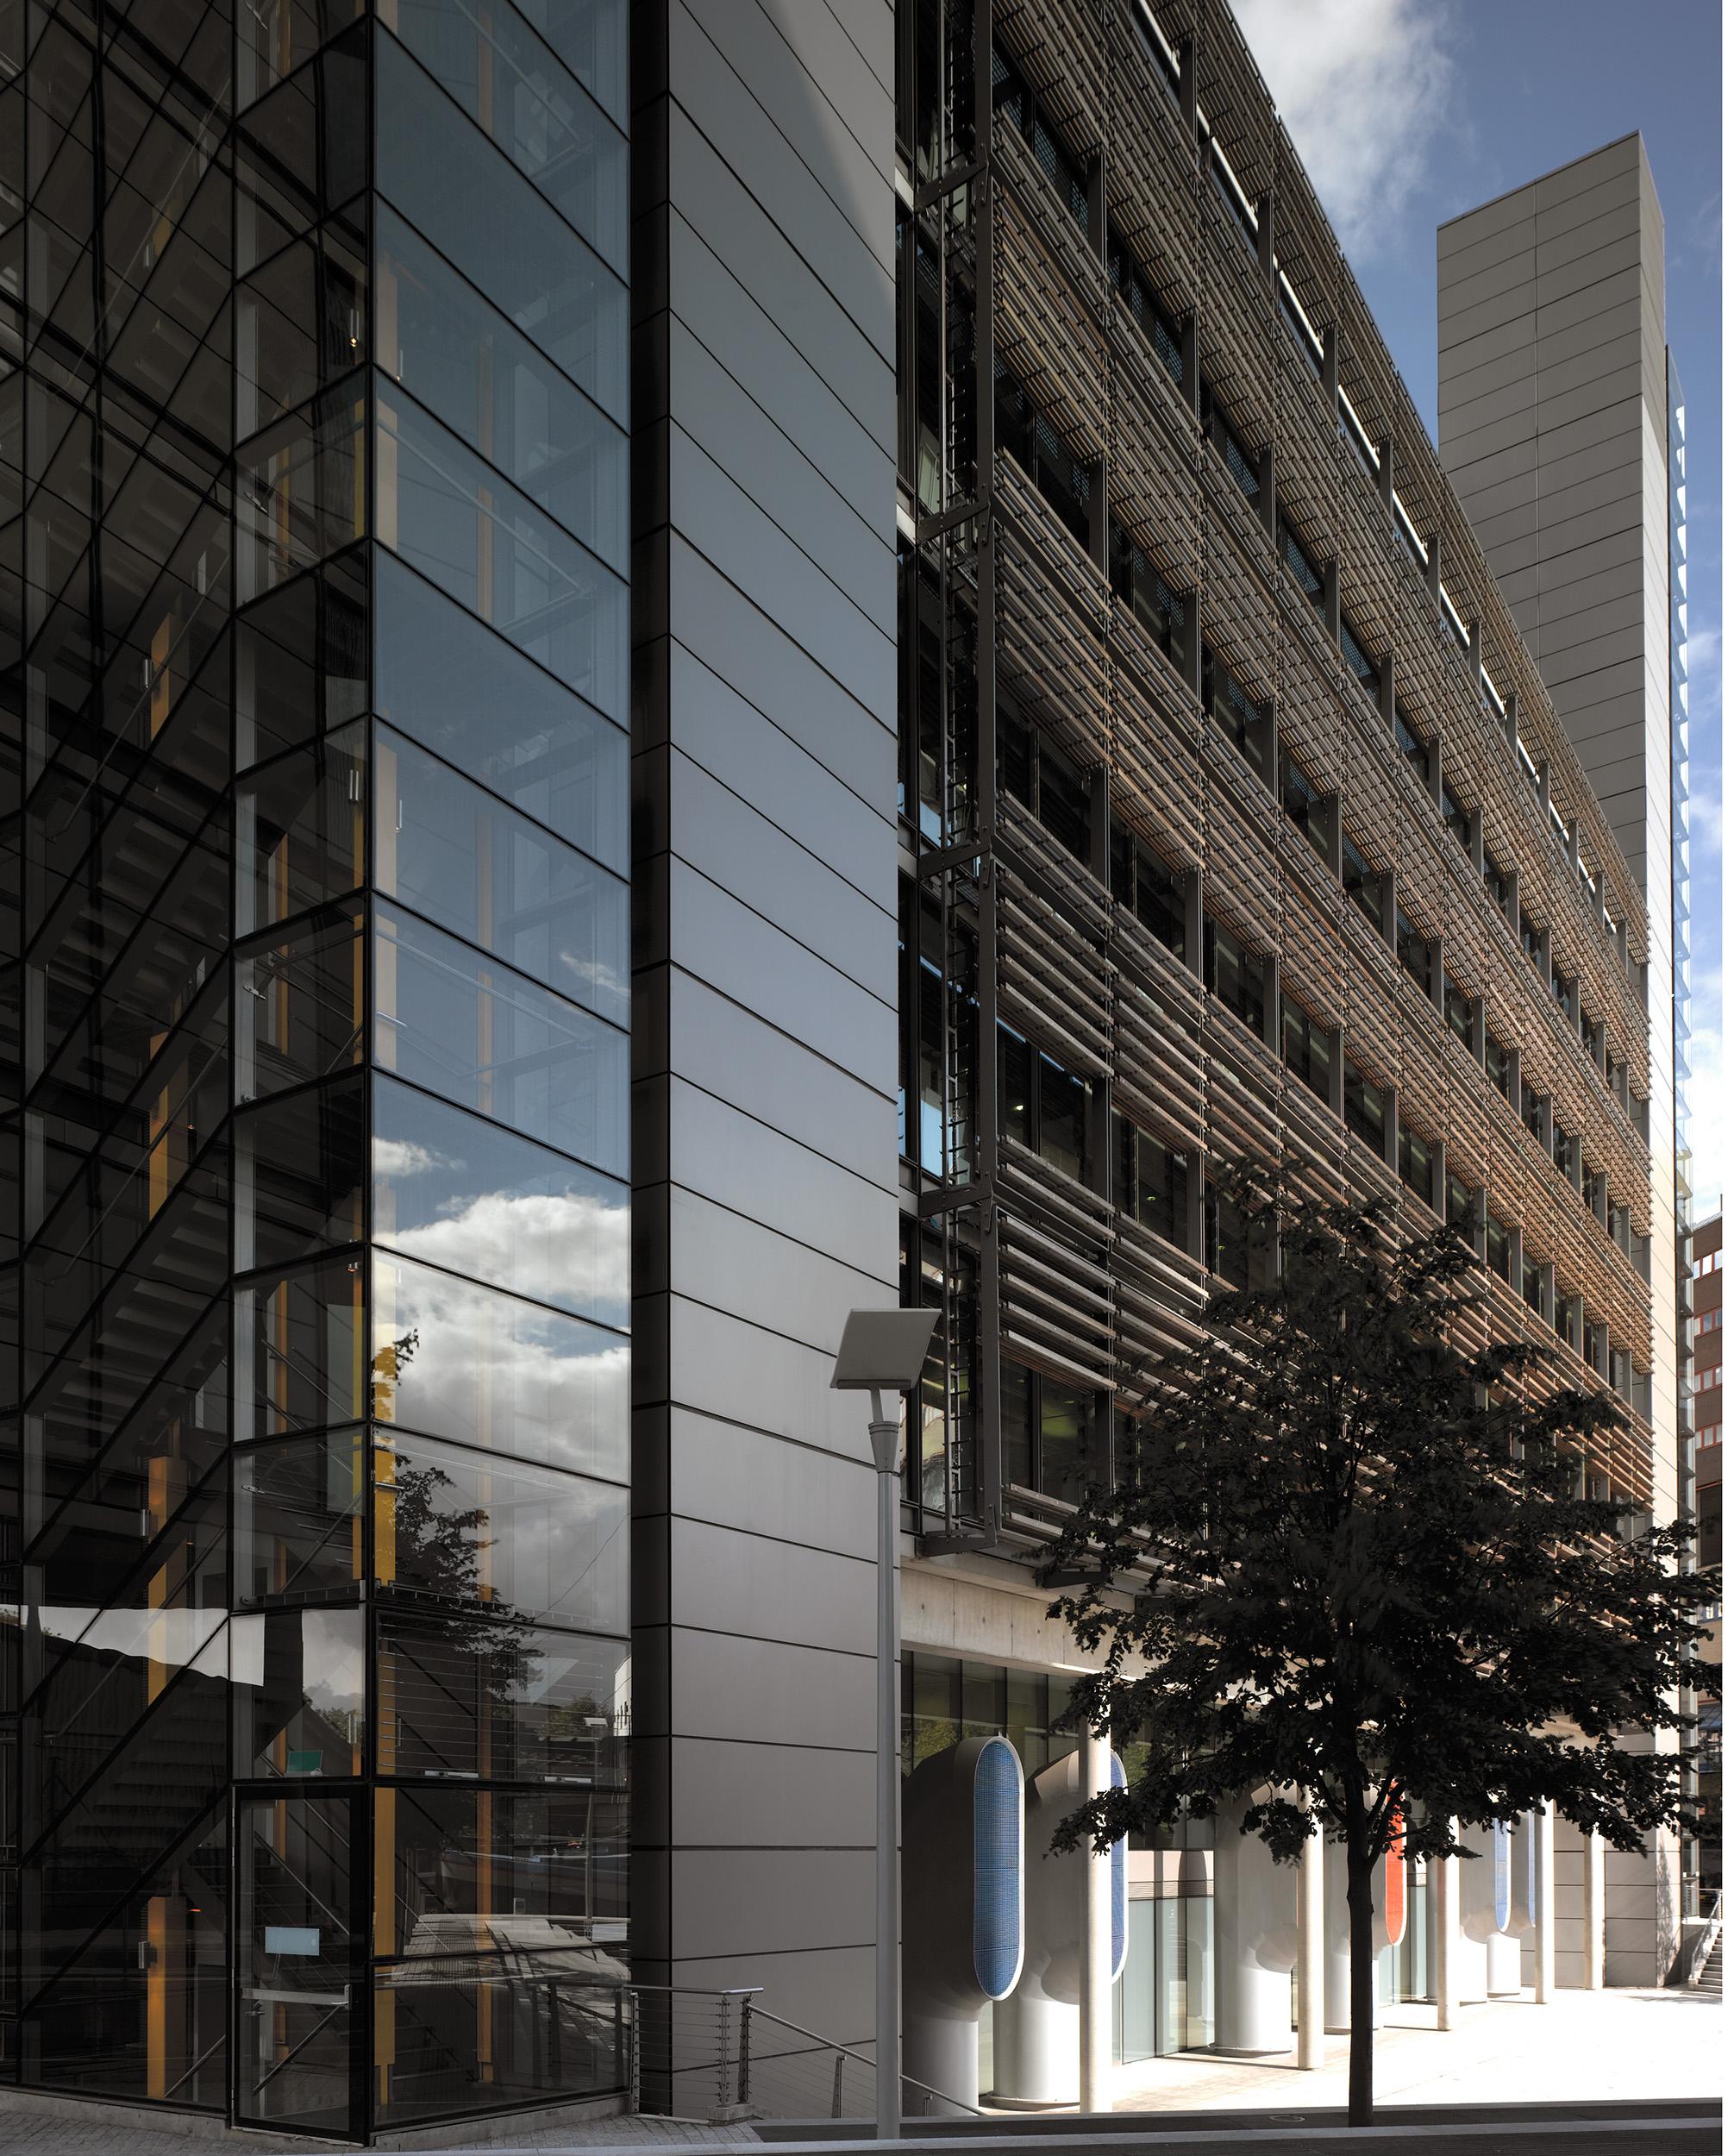 Paddington Waterside / Rogers Stirk Harbour + Partners